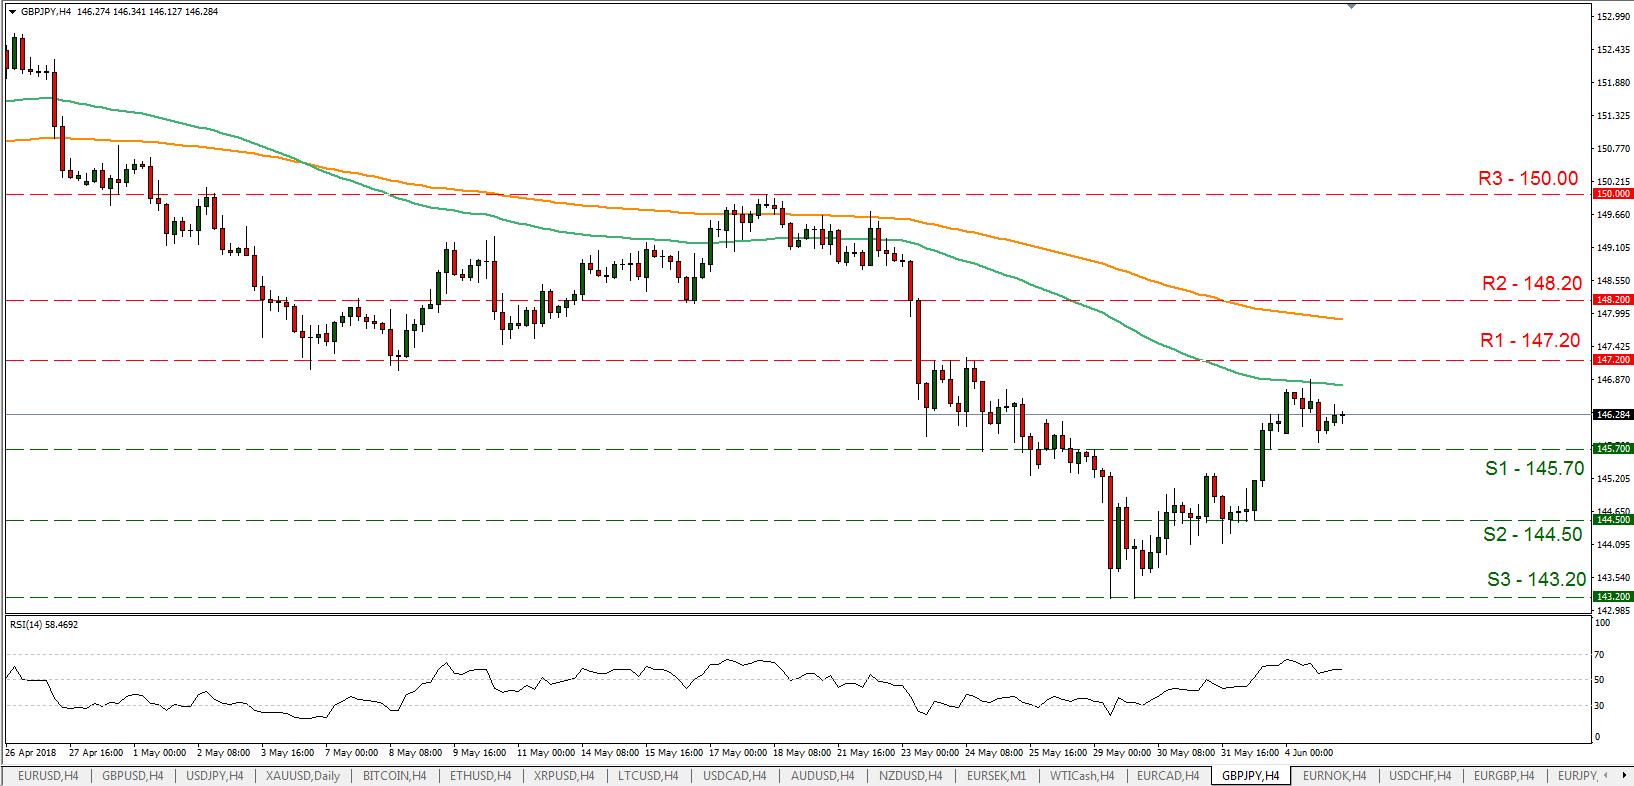 GBP/JPY 06/05/2018 | EconAlerts